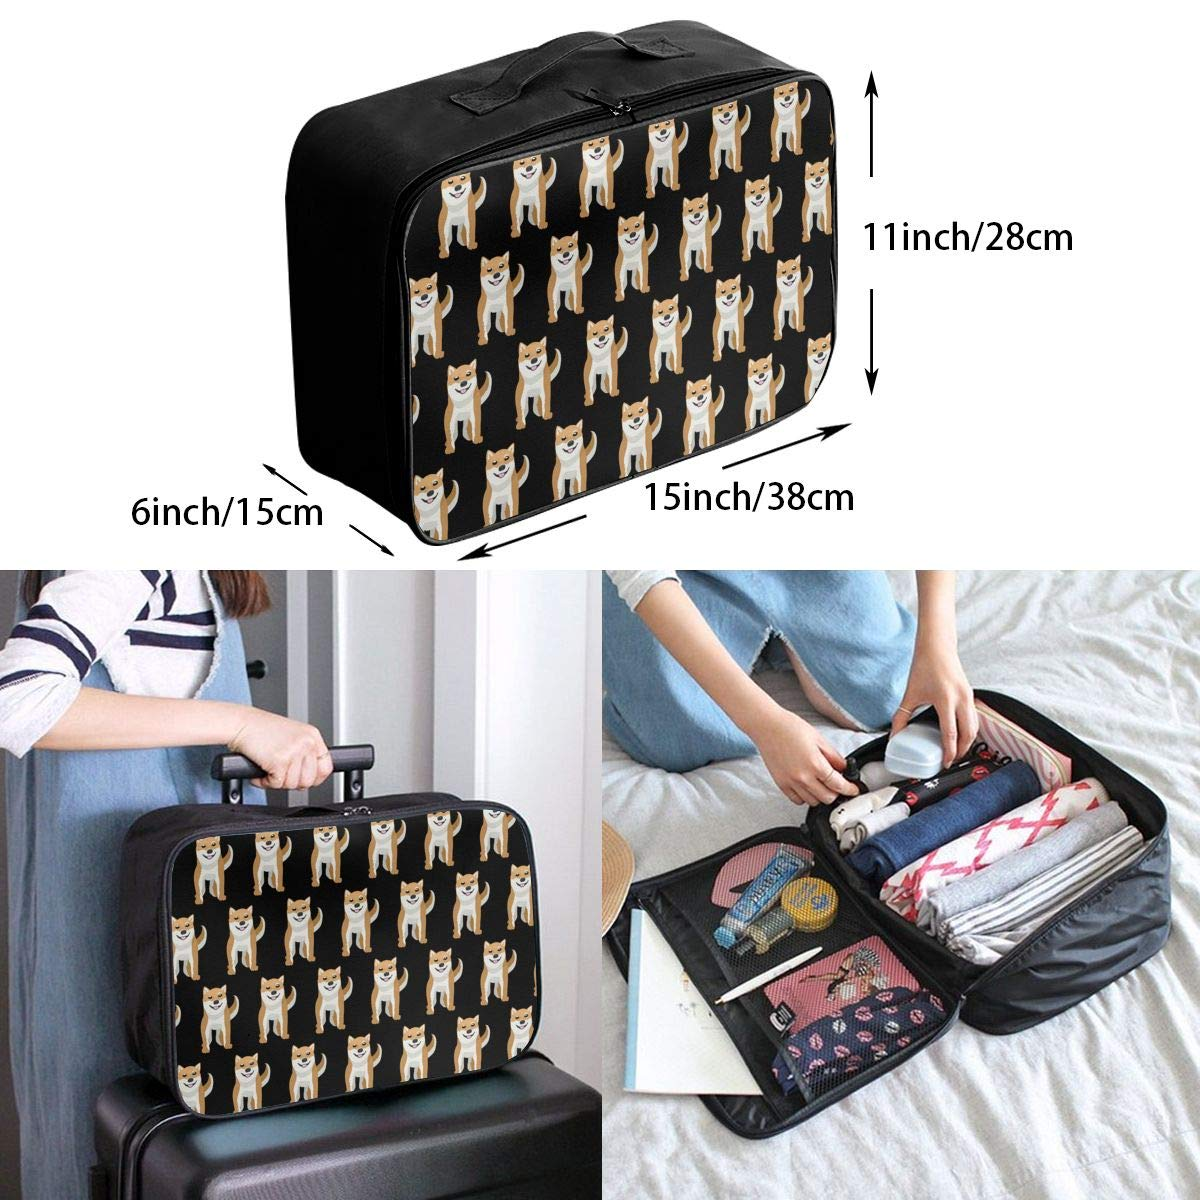 YueLJB Cute Shiba Inu Lightweight Large Capacity Portable Luggage Bag Travel Duffel Bag Storage Carry Luggage Duffle Tote Bag